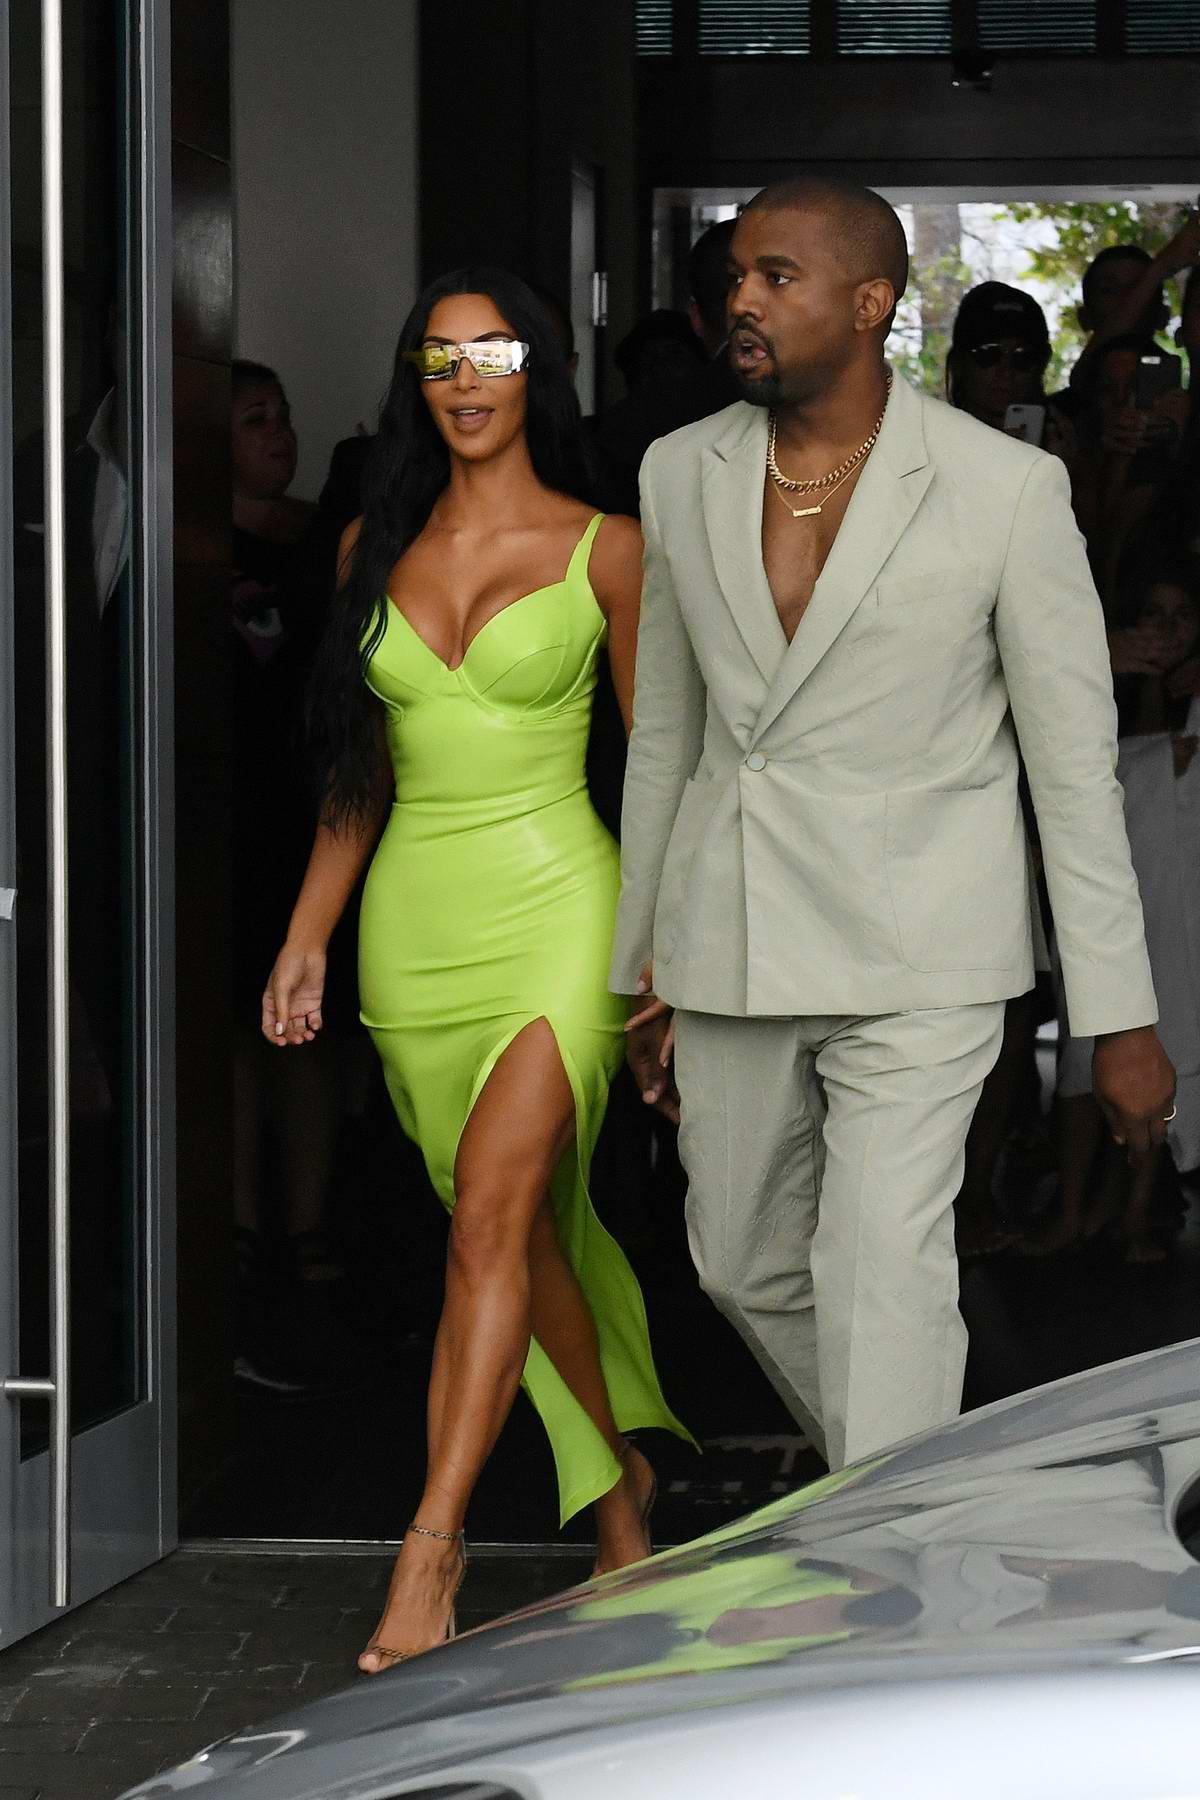 Kim Kardashian and Kanye West arrives at 2-Chainz's wedding in Miami, Florida